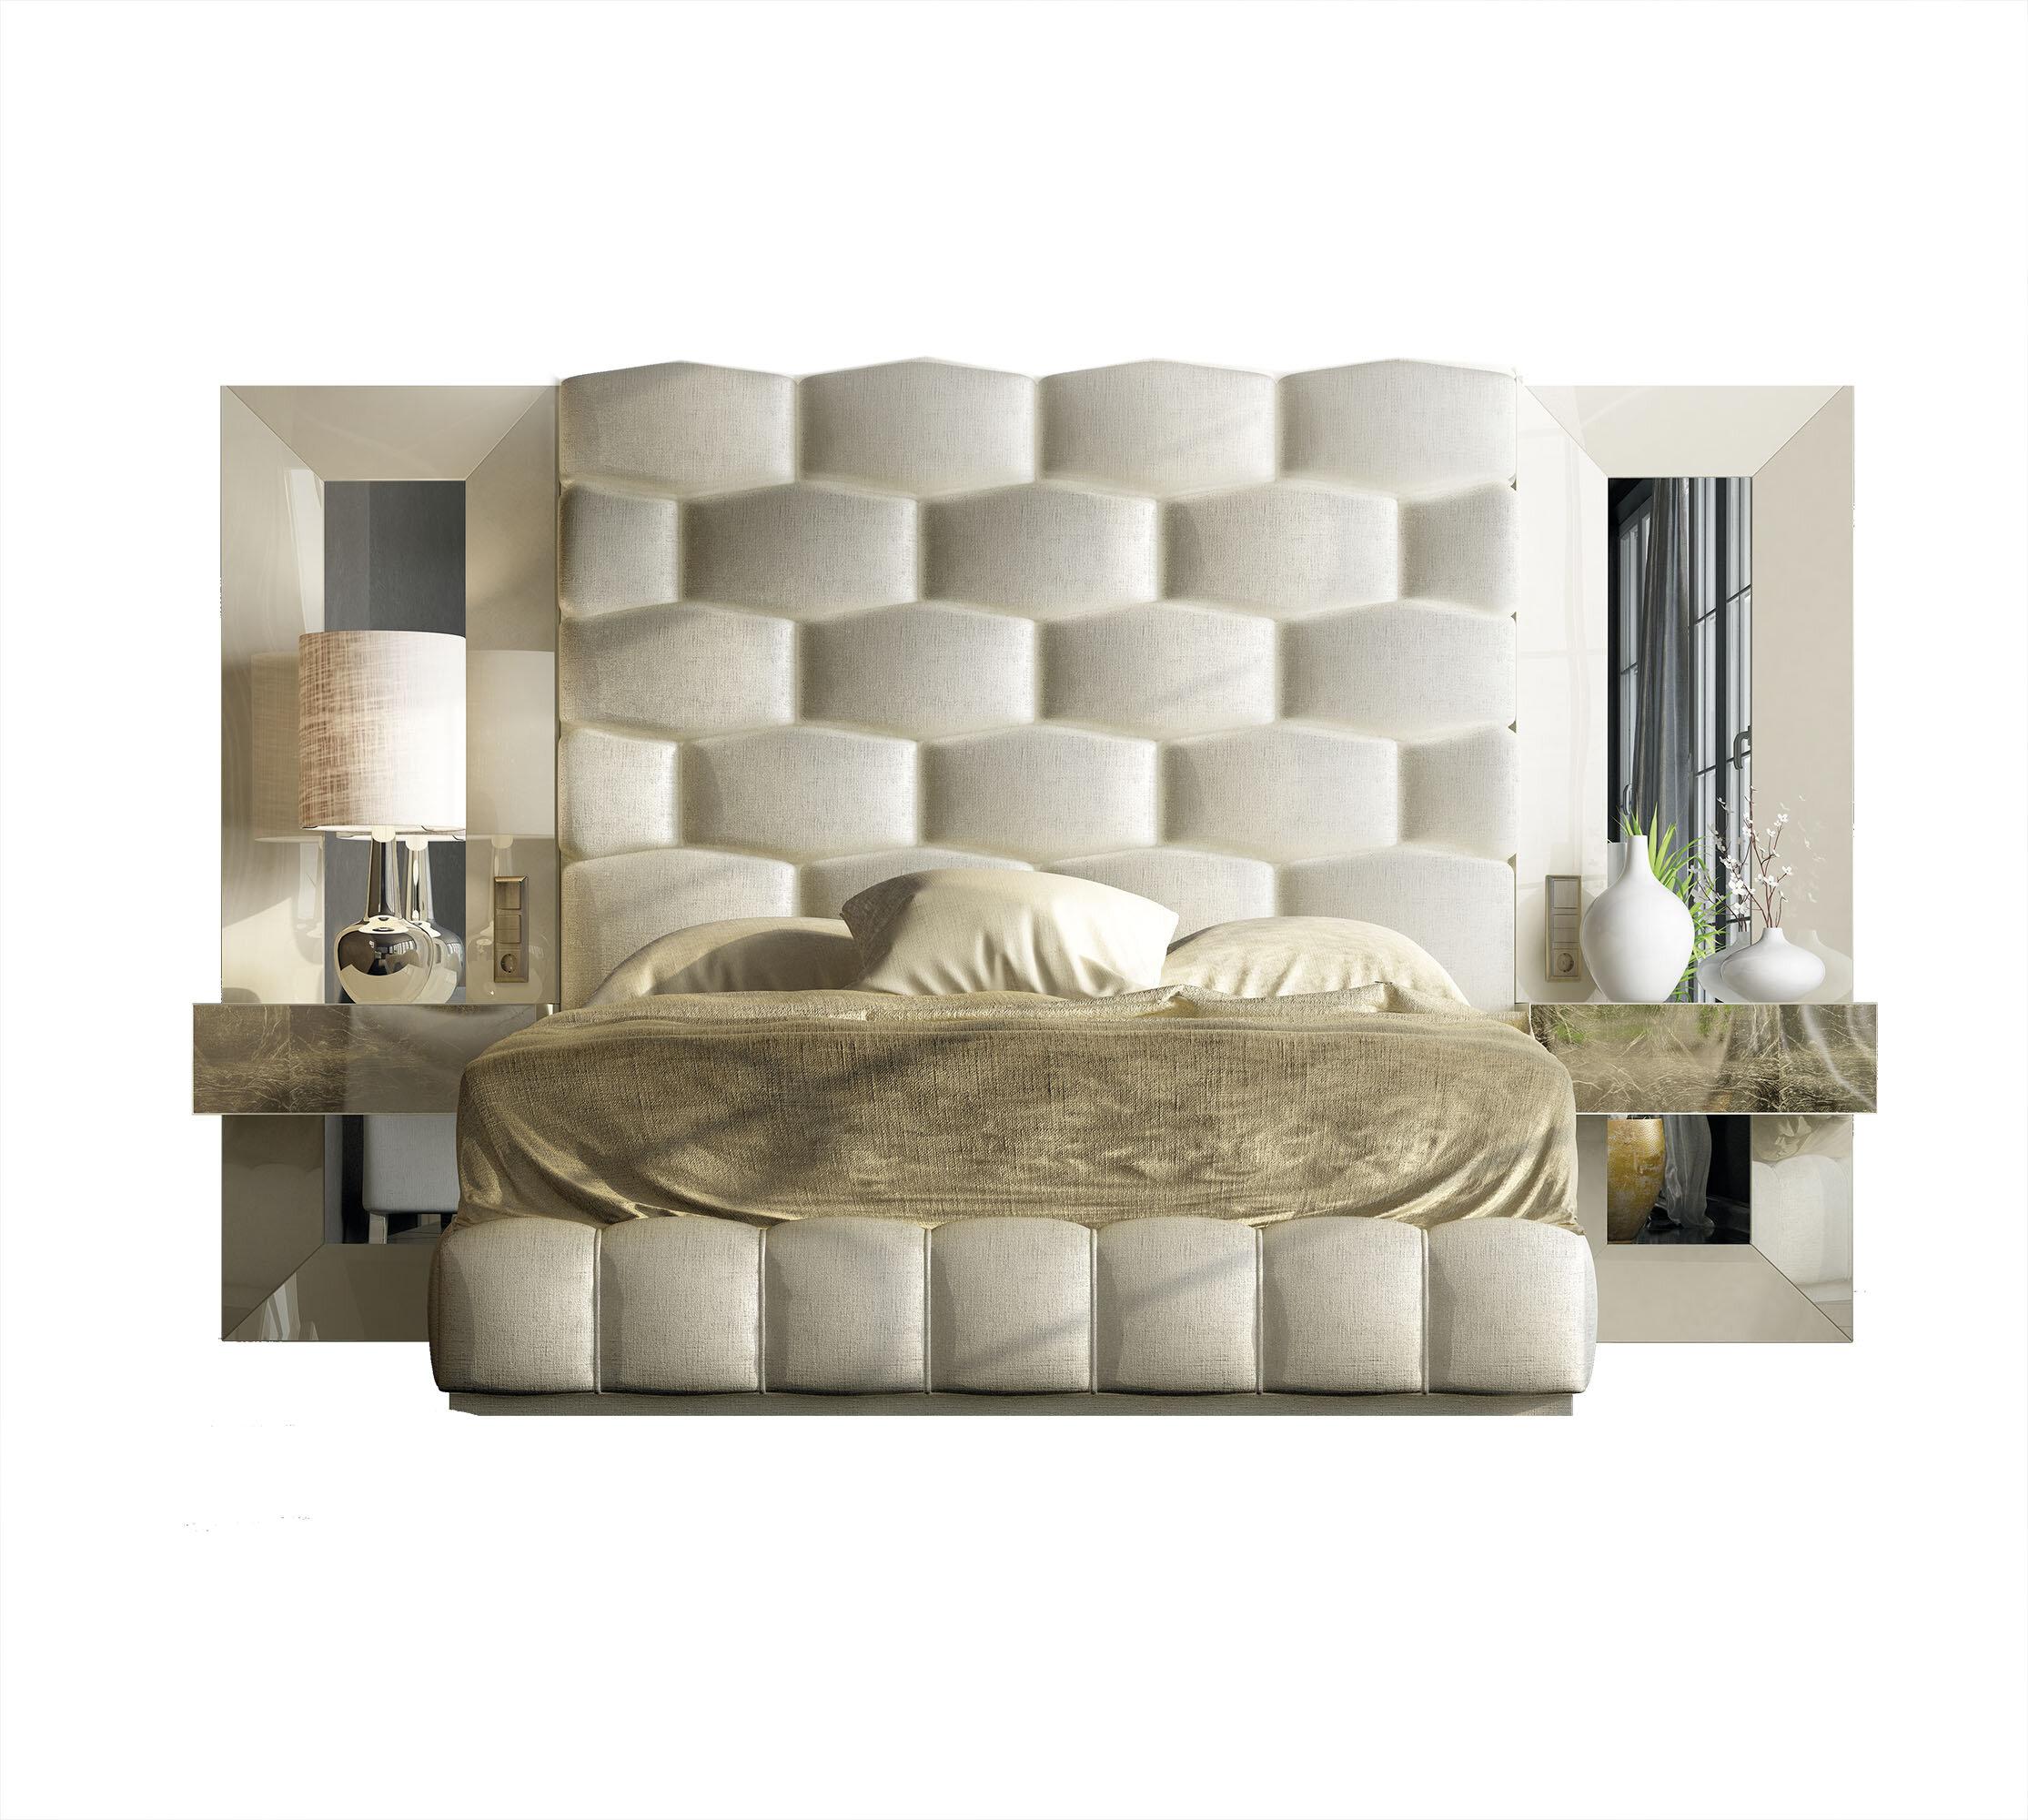 Hispania Home London Bedor34 Bedroom Set 5 Pieces Wayfair